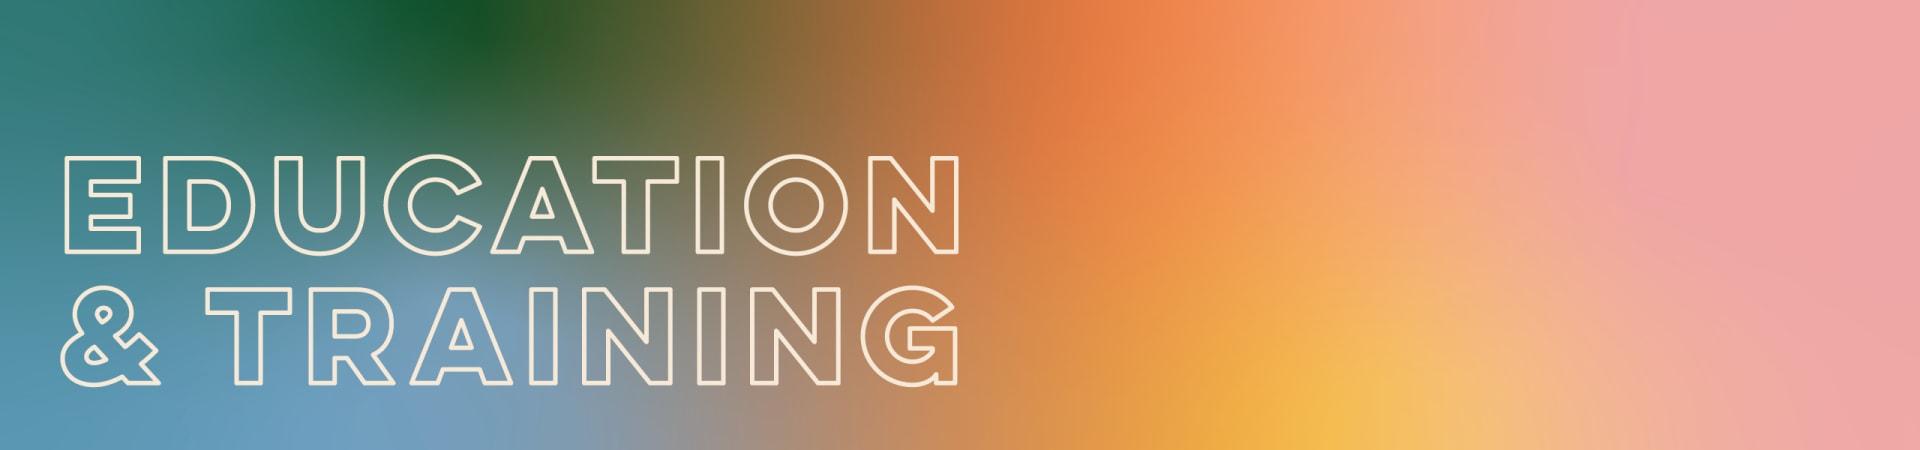 Rainbow Gradient Education Banner